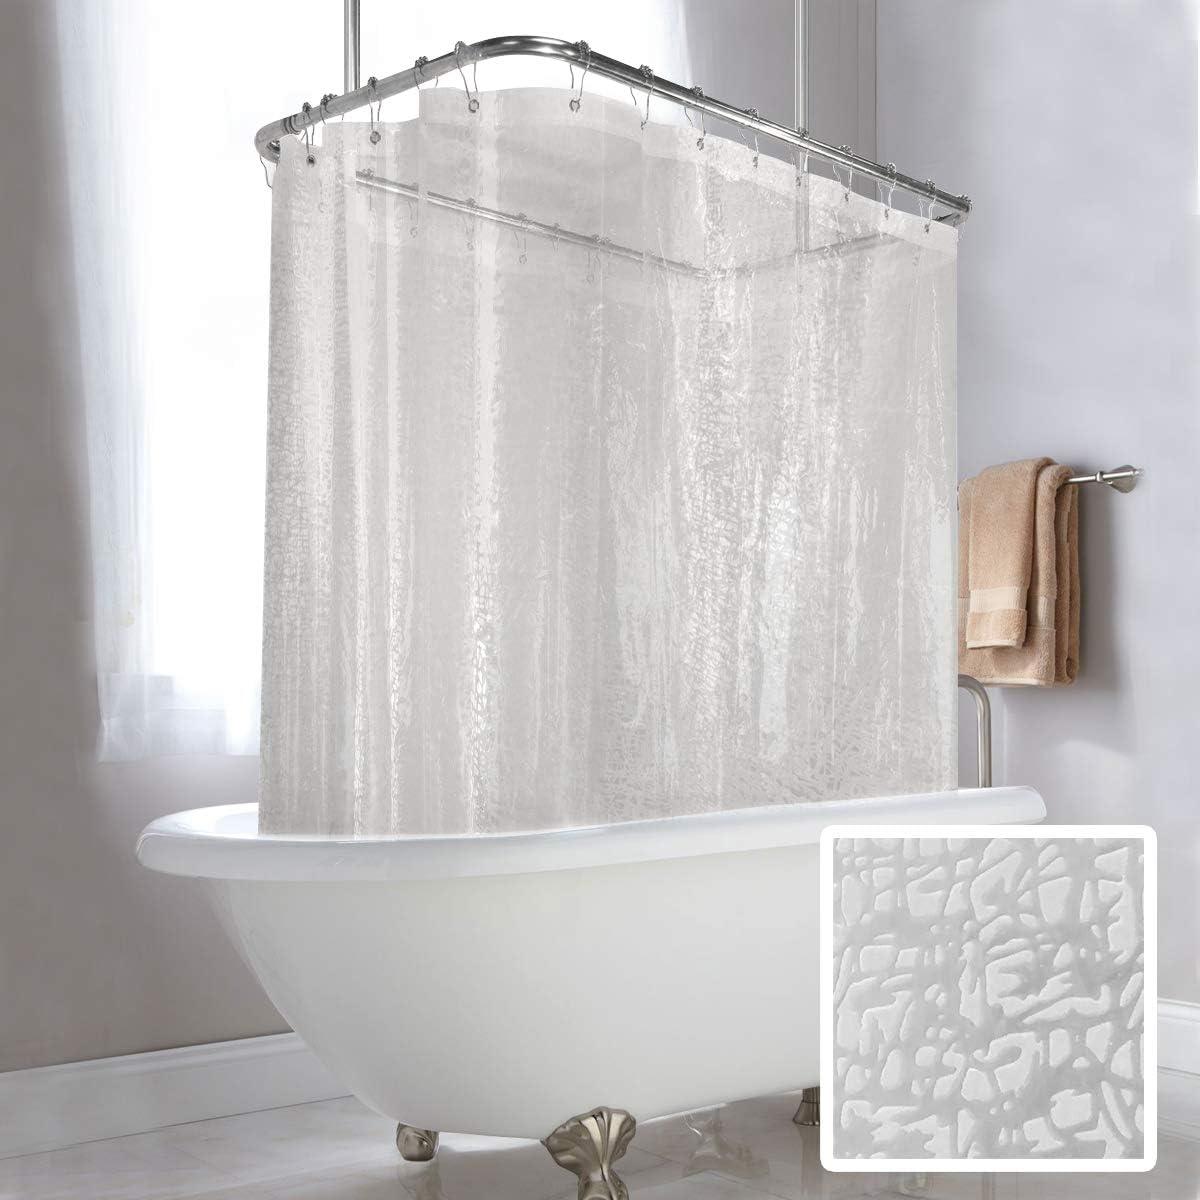 Amazon.com: YISURE Shower Curtain Set for Bathroom Tub All Wrap